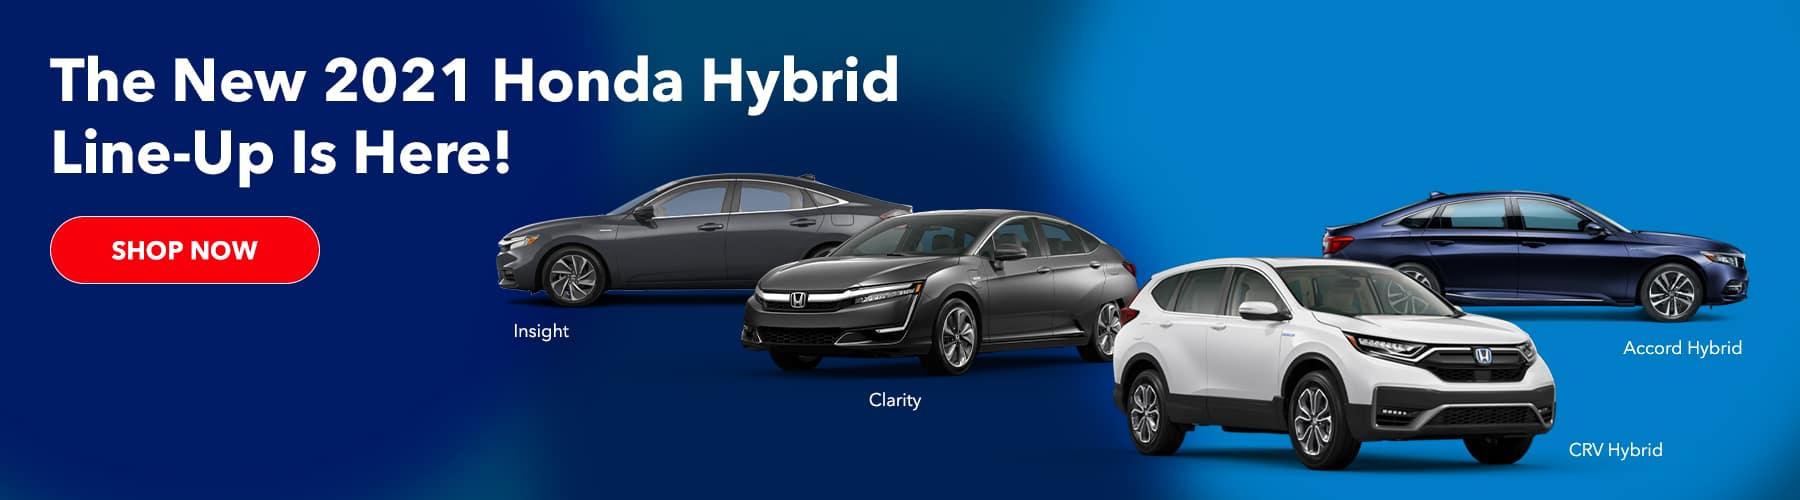 2021 Honda Hybrids